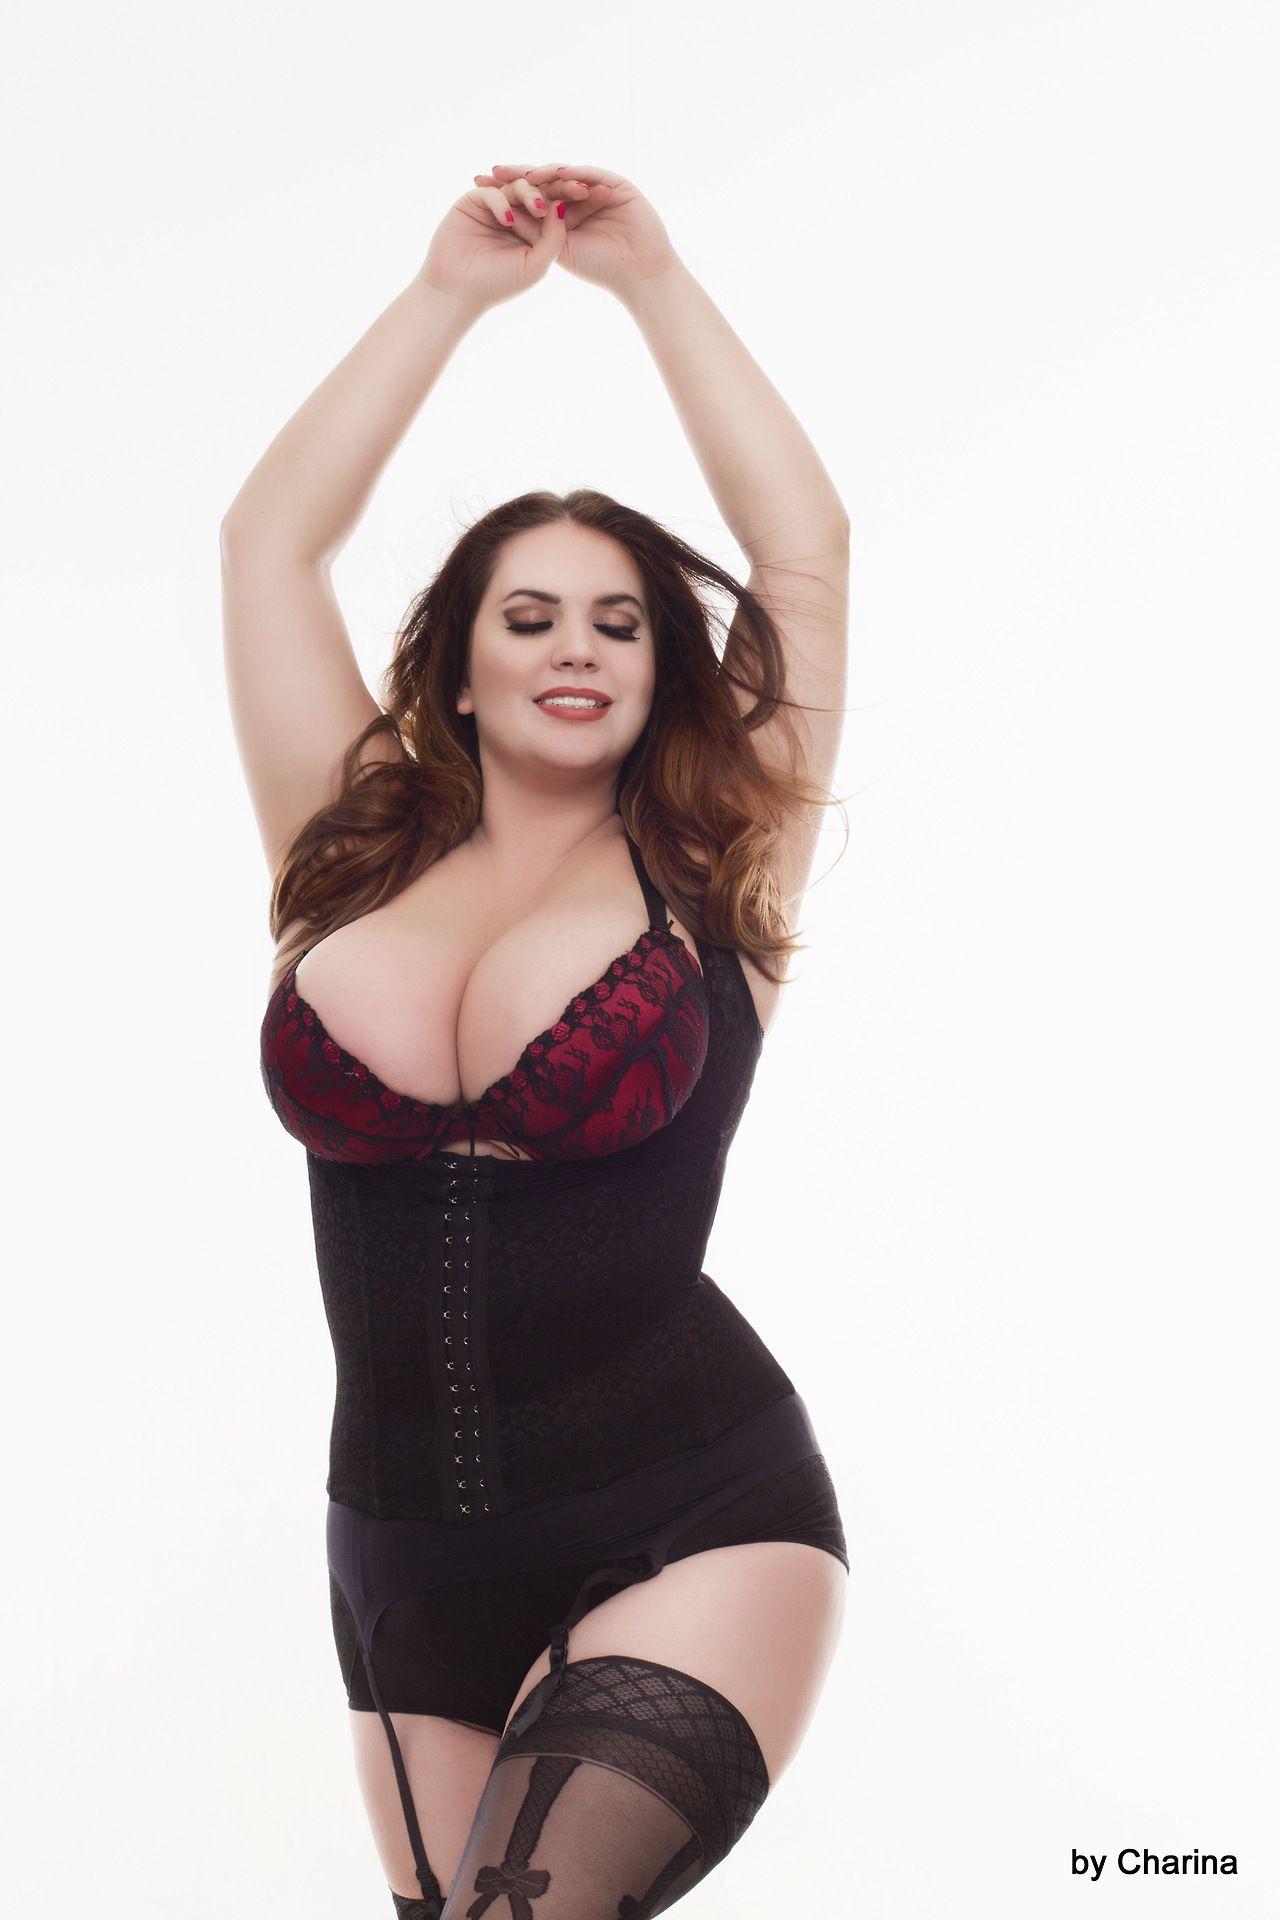 Bbw Lingerie Tumblr Top plus size model inna kulin | Любоваться женщинами | pinterest